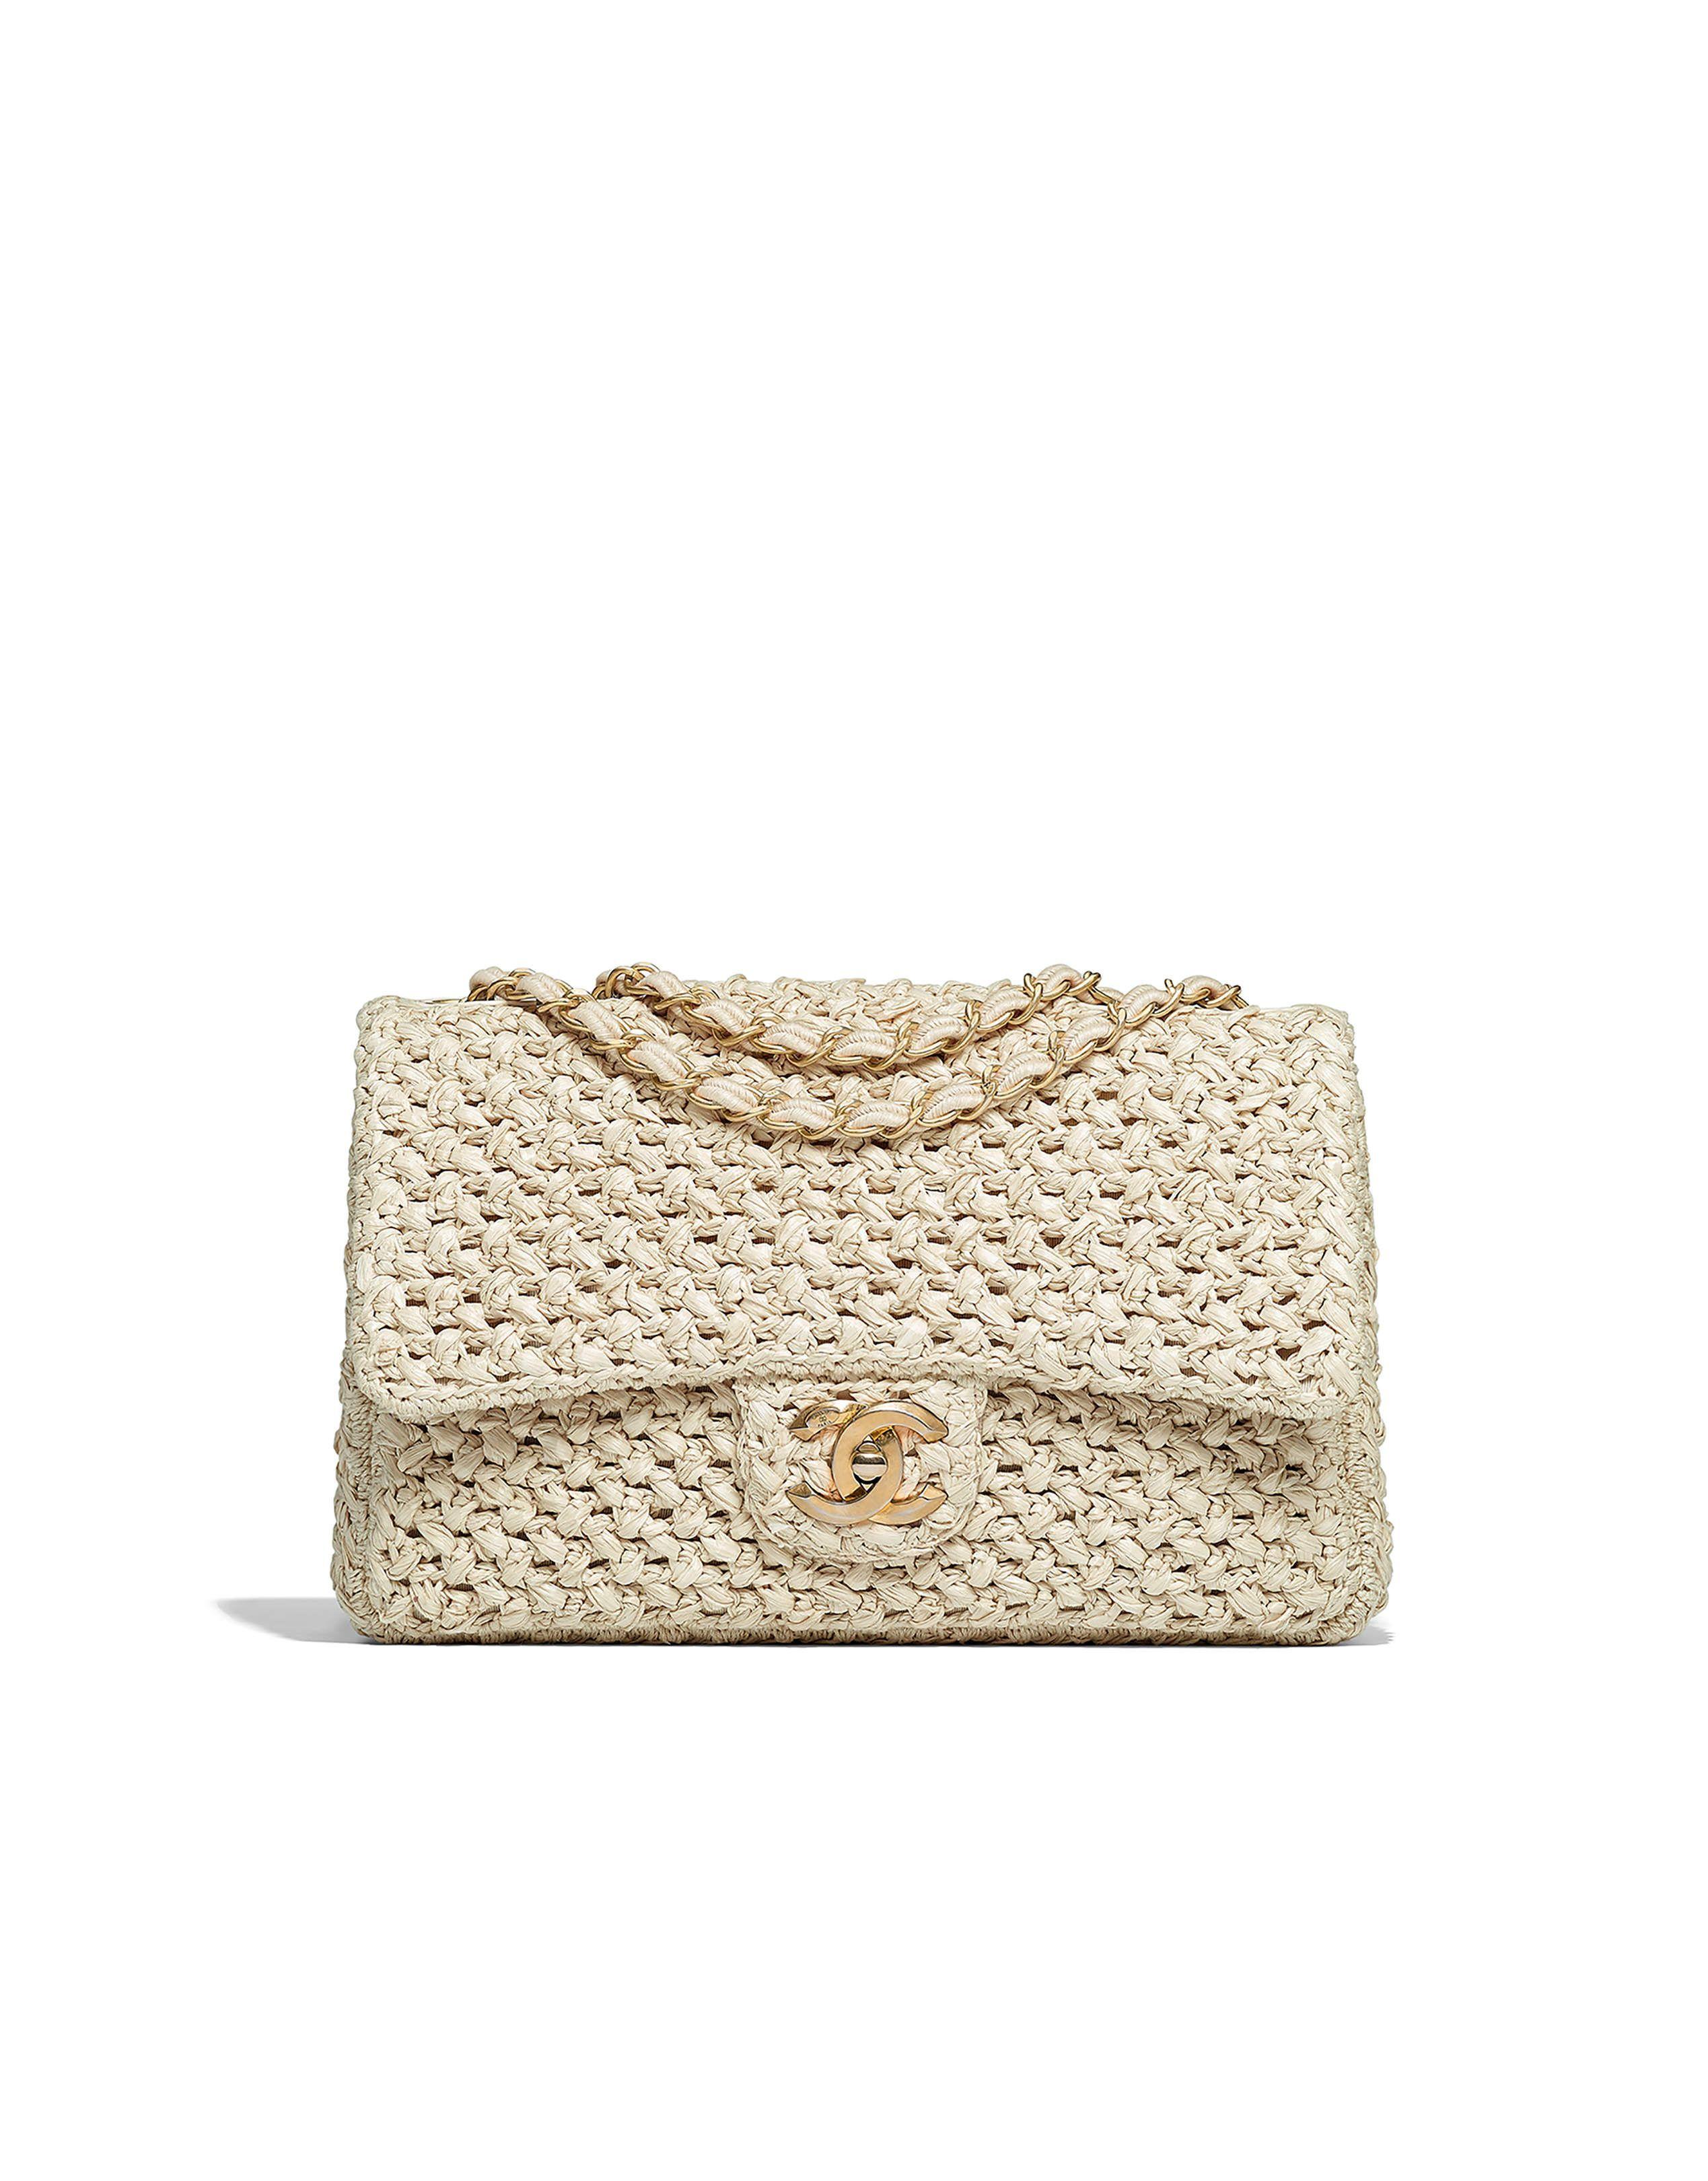 723fb6774a1a Chanel - Cruise 2017 2018   Crochet flap bag   Chanel handbags ...